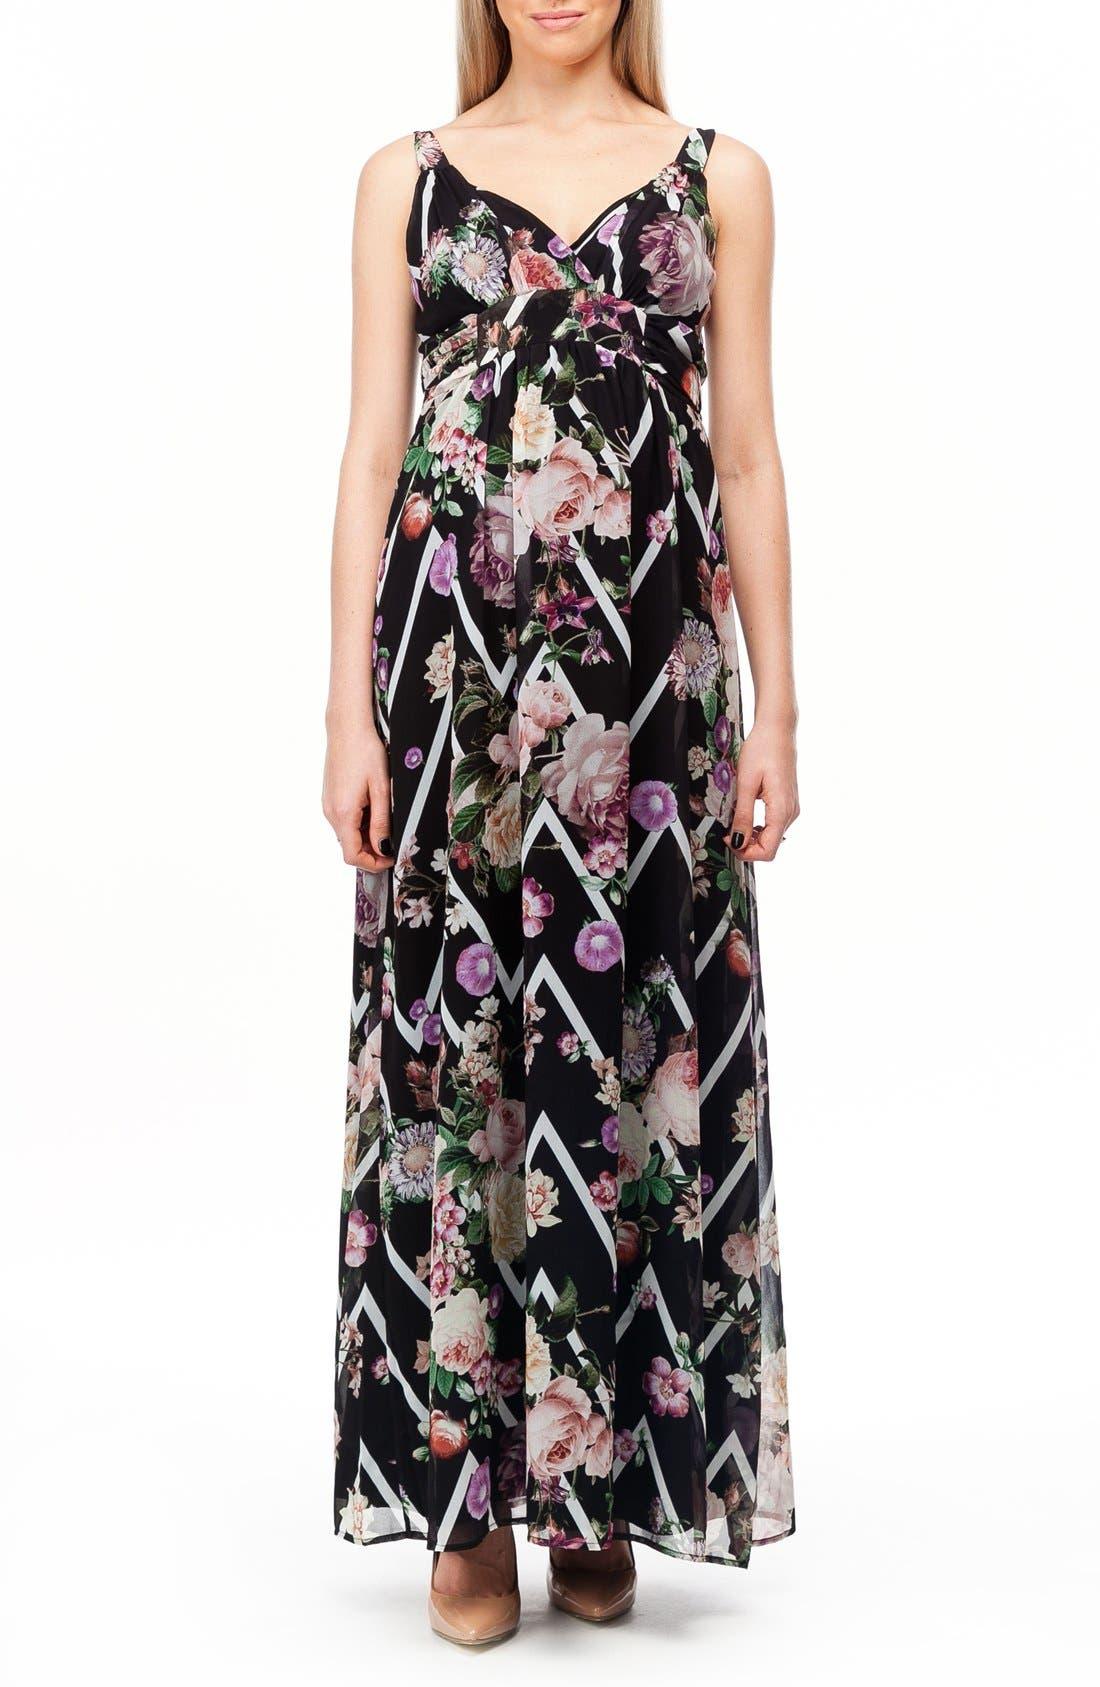 Murano Maternity Maxi Dress,                             Main thumbnail 1, color,                             FLOWER ZIGZAG